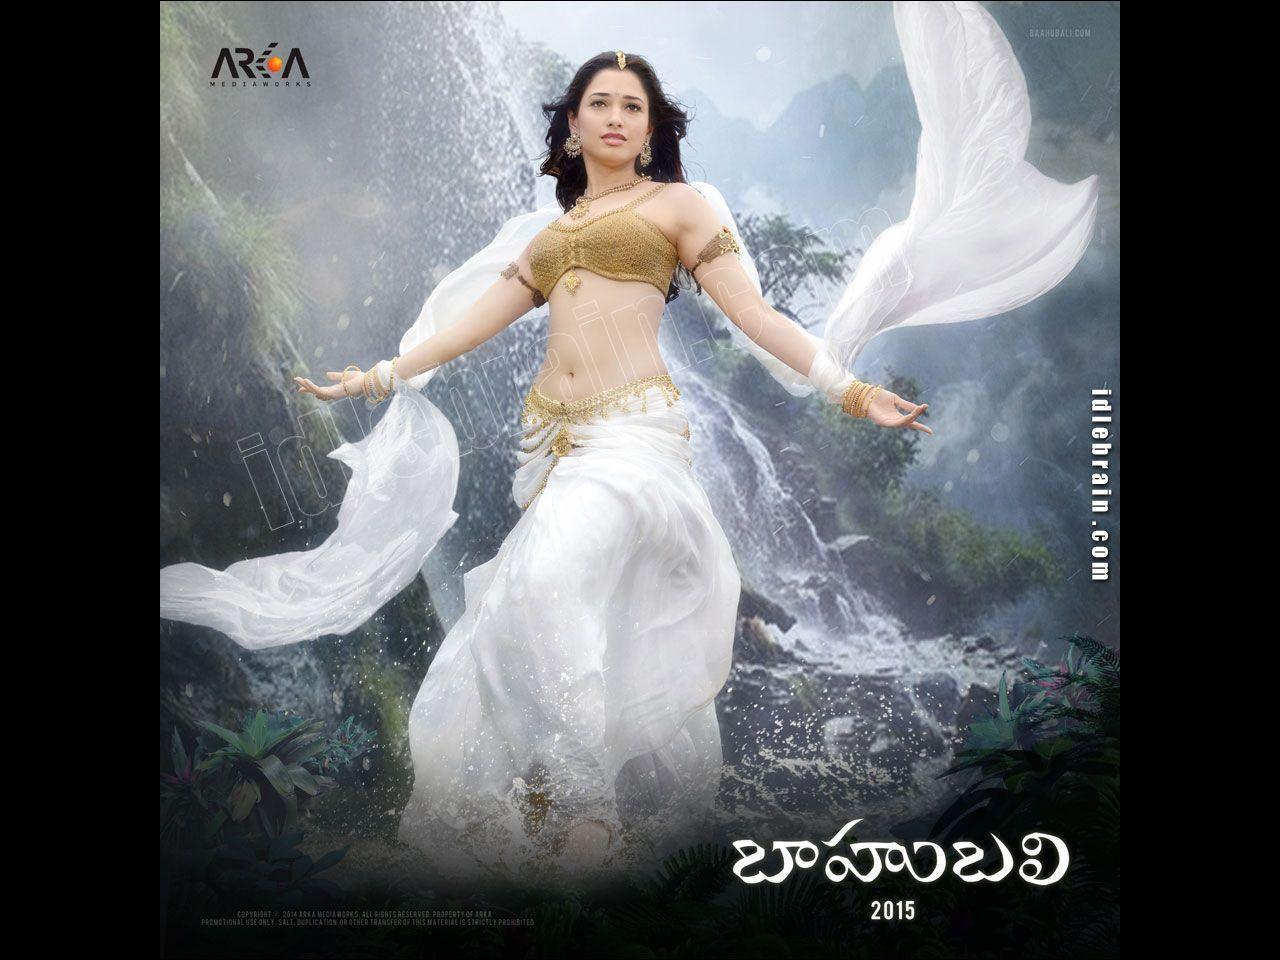 Baahubali wallpapers - Telugu cinema posters - Prabhas